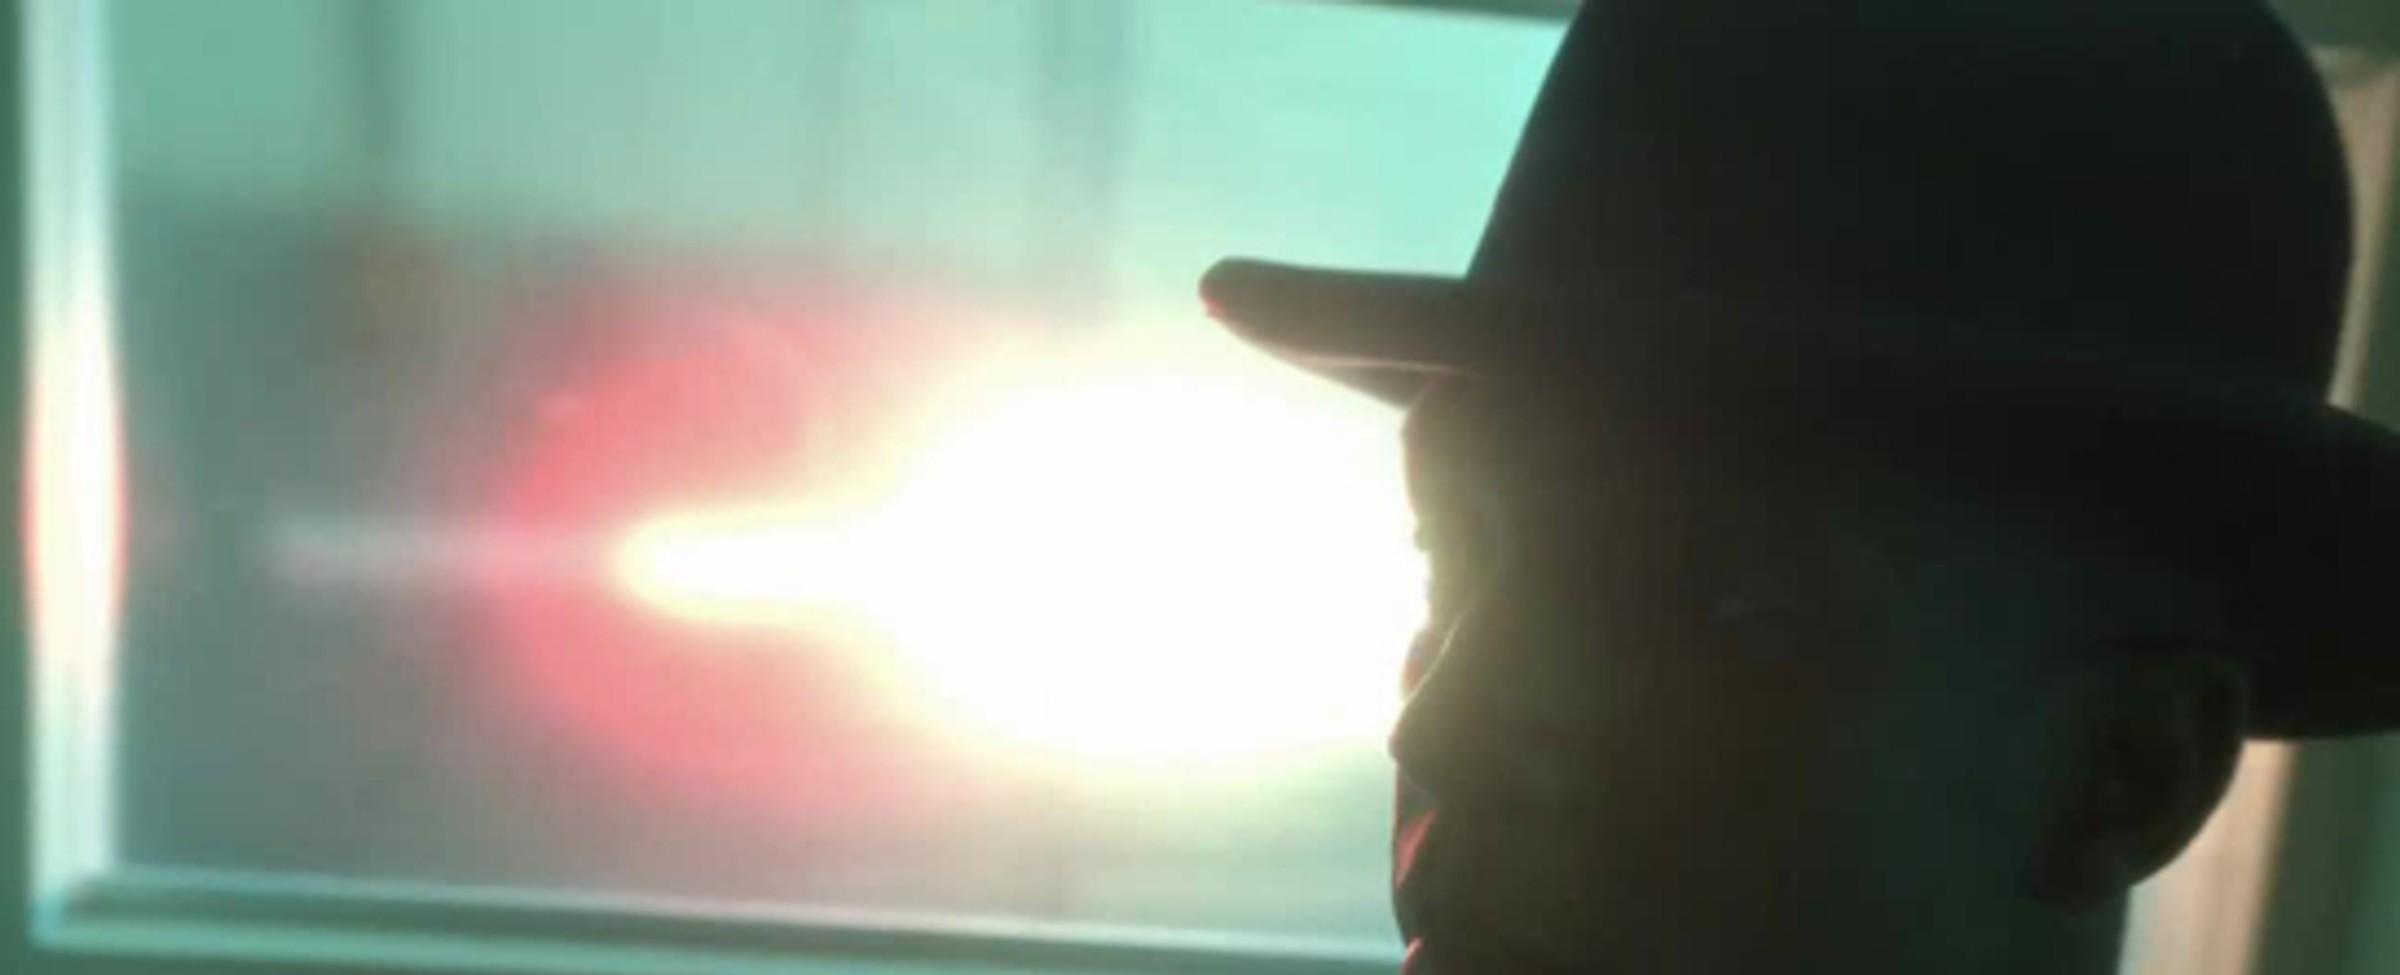 Tísňová linka - Paranormal 911 II.